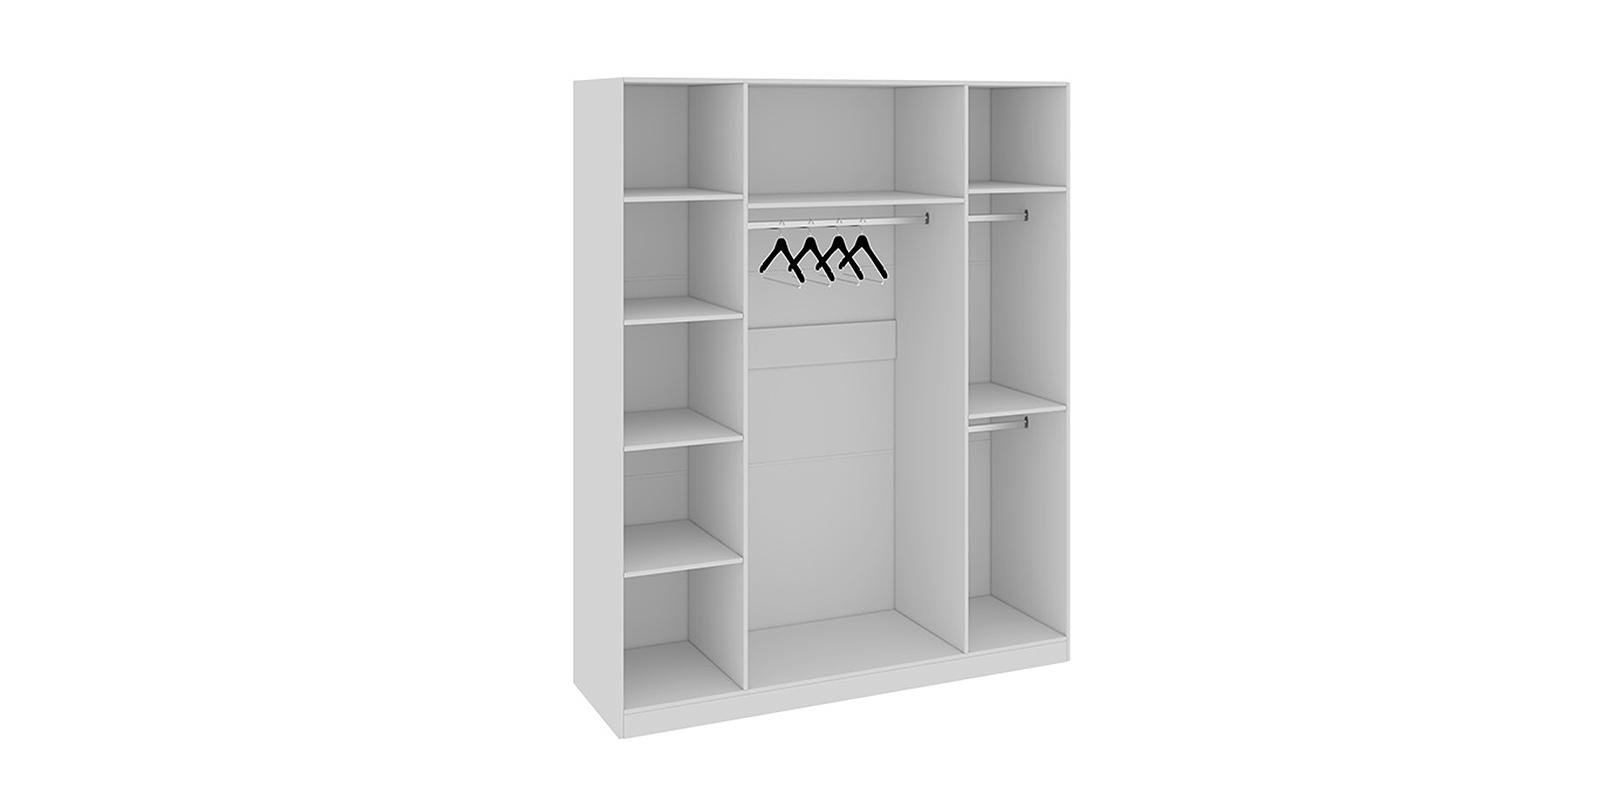 Шкаф распашной 4-х дверный Давос (белый матовый/зеркало)